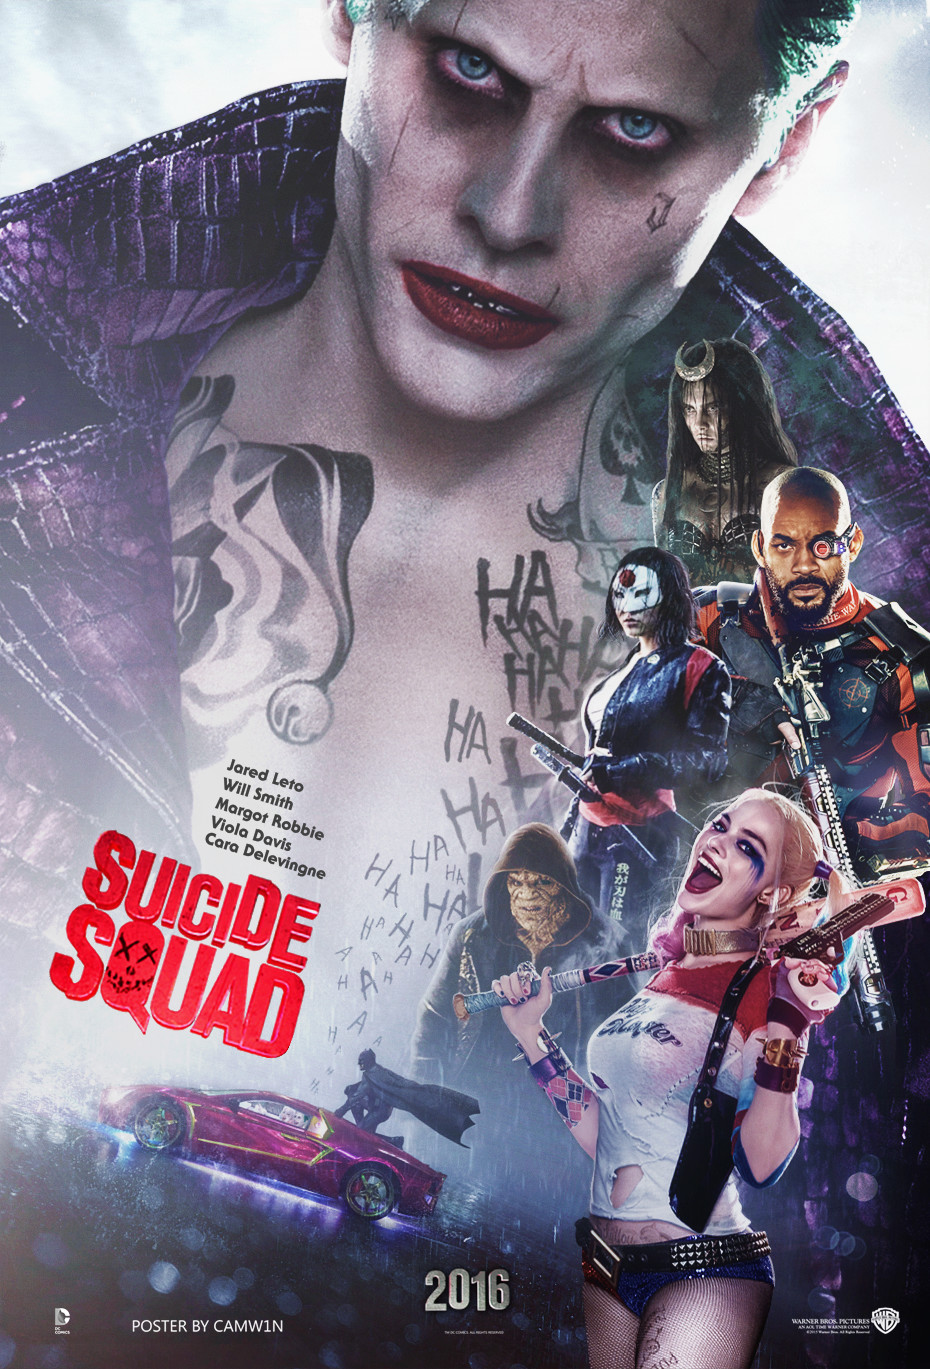 Suicide Squad Movie 2016 wallpaper HD desktop background 2016 in 930x1369